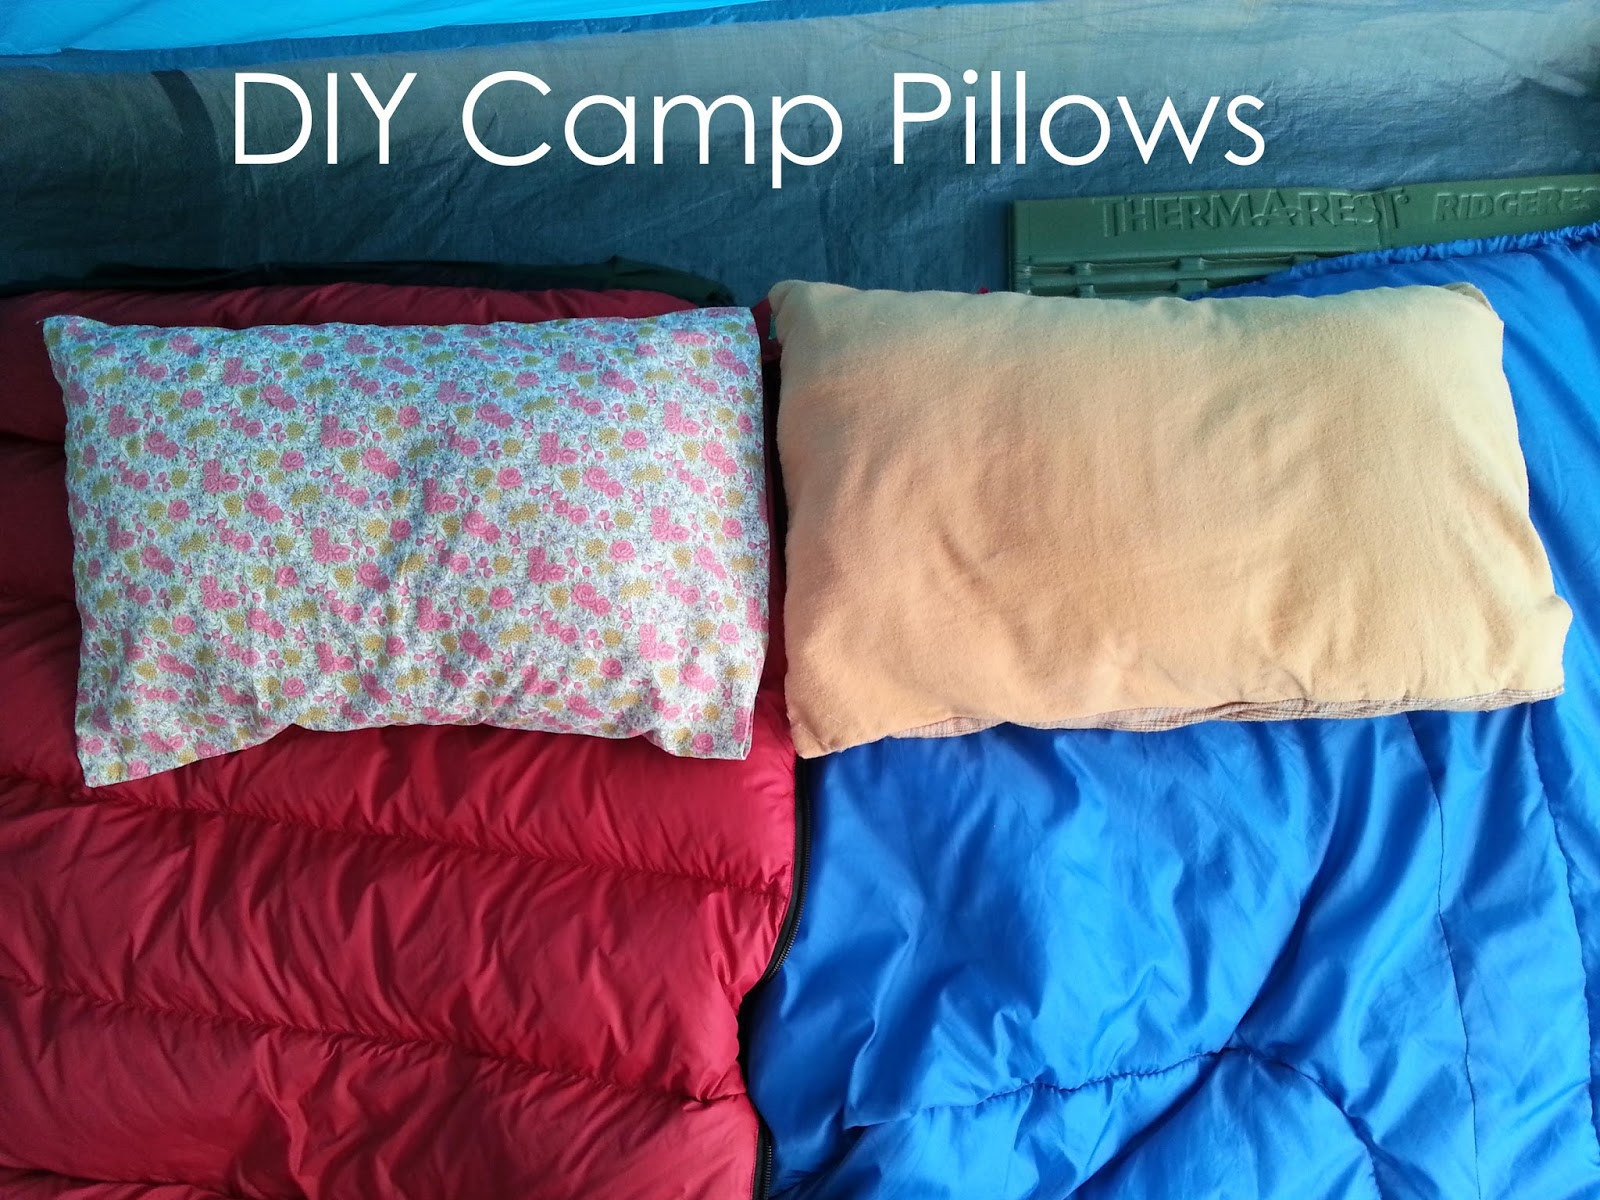 My Handmade Home DIY Camp Pillows with Envelope Enclosure